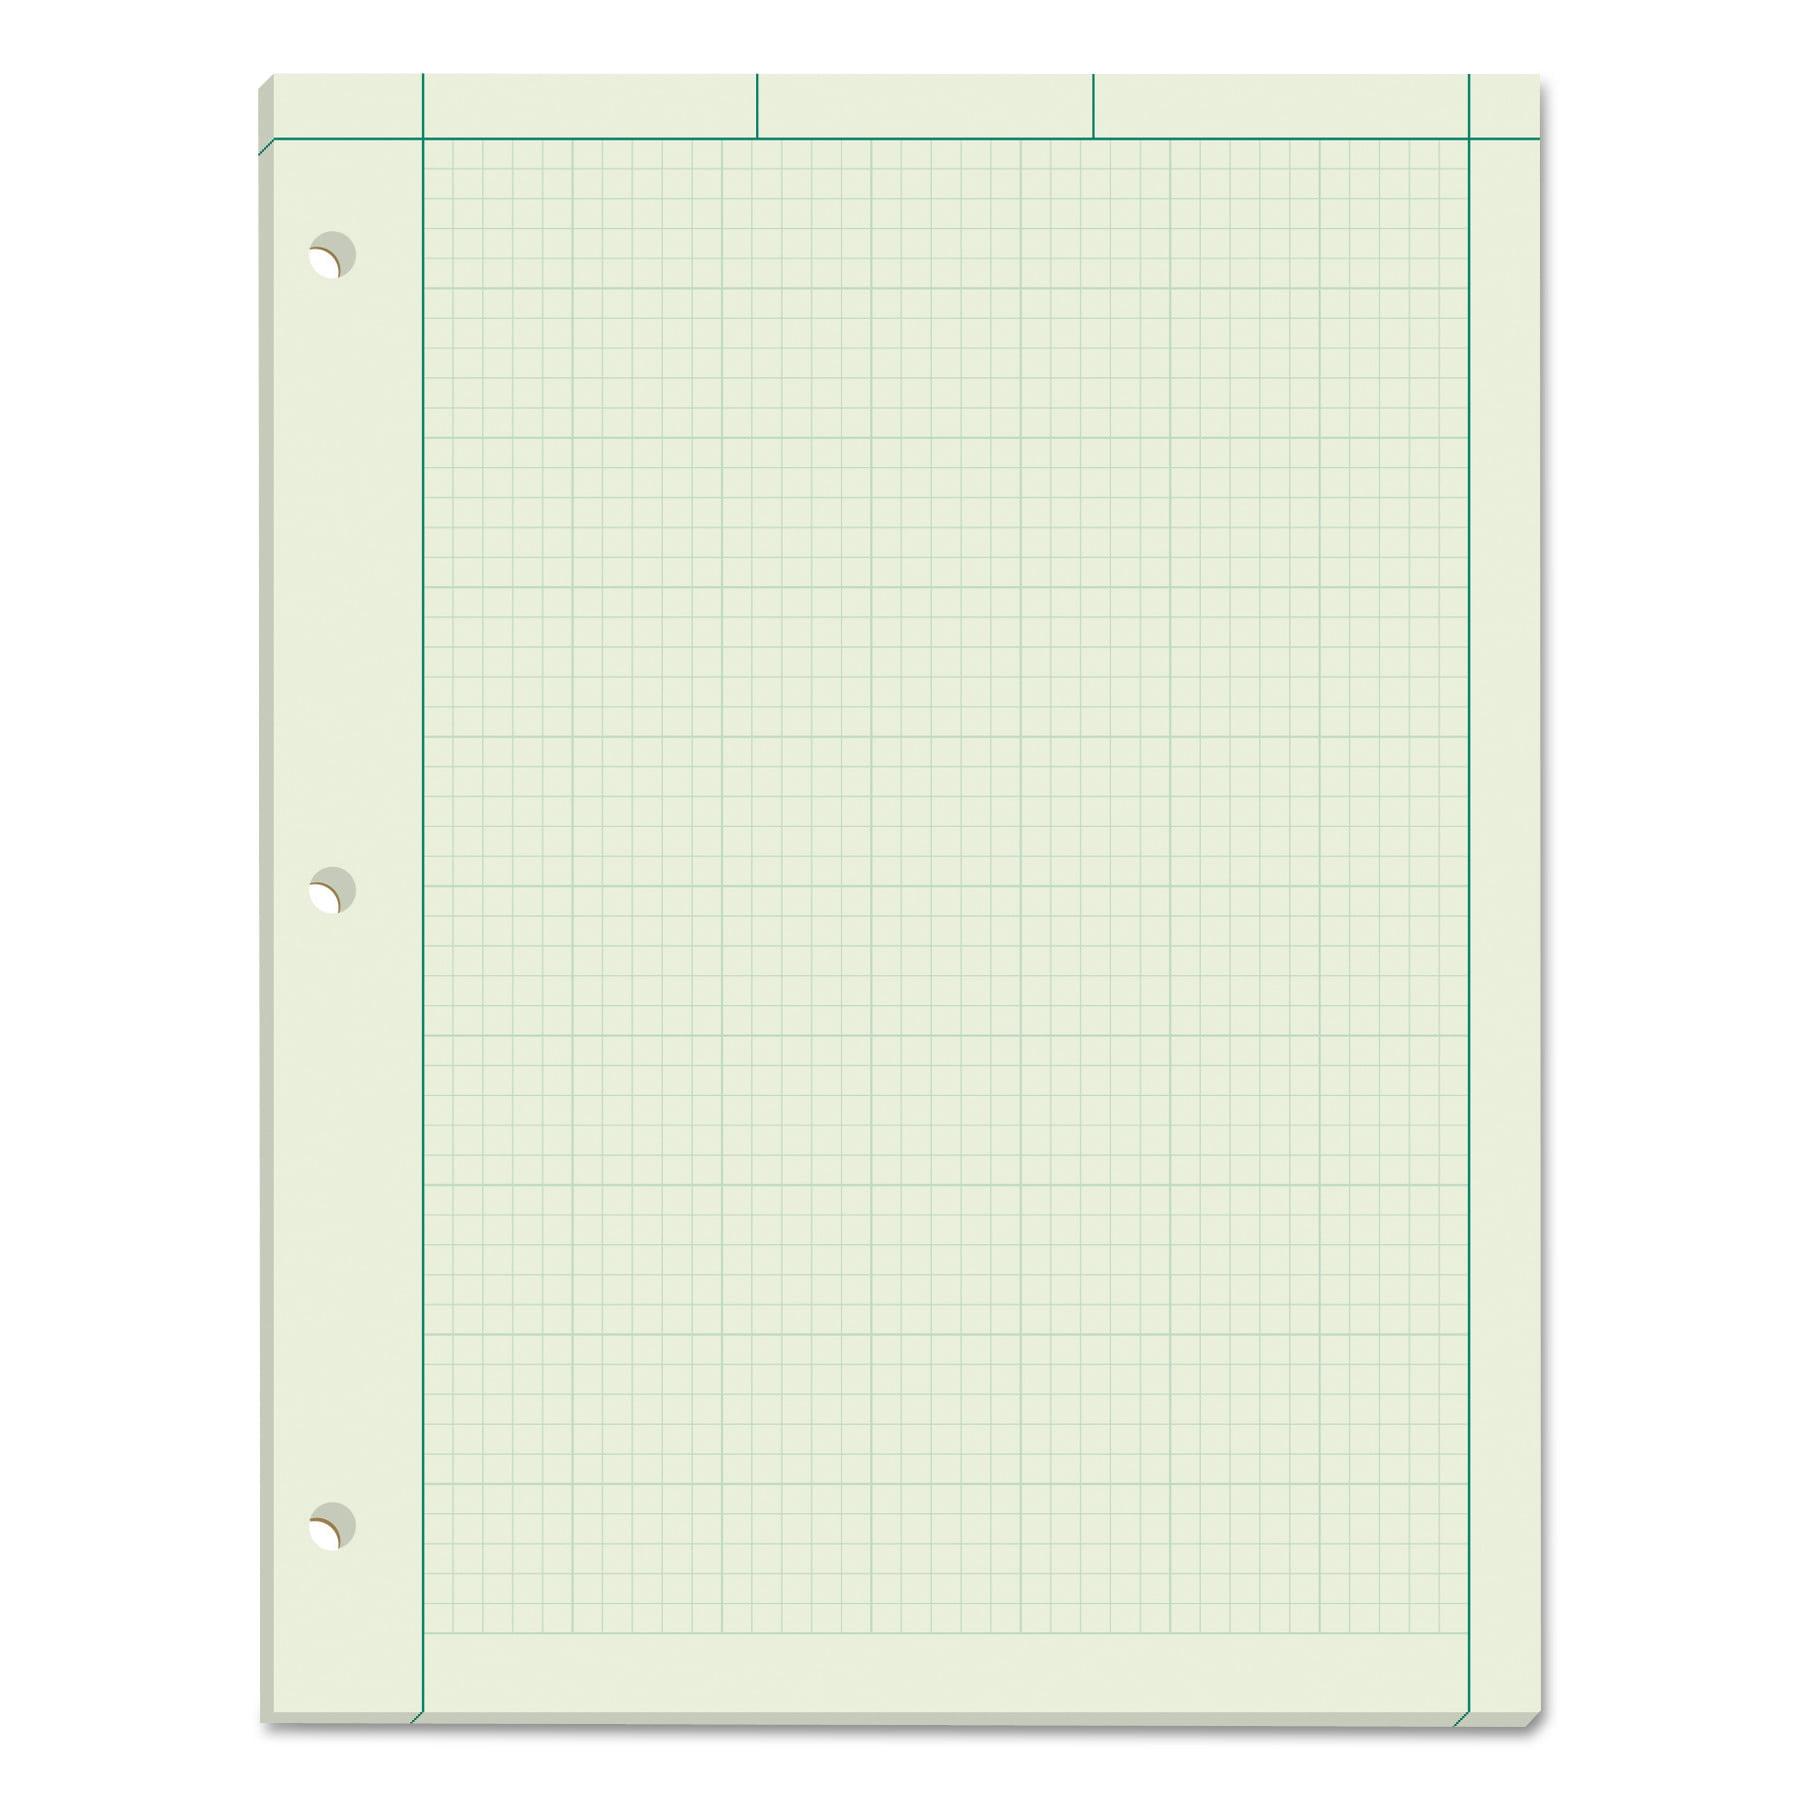 TOPS Engineering Computation Pad, 8 1/2 x 11, Green, 100 Sheets -TOP35500